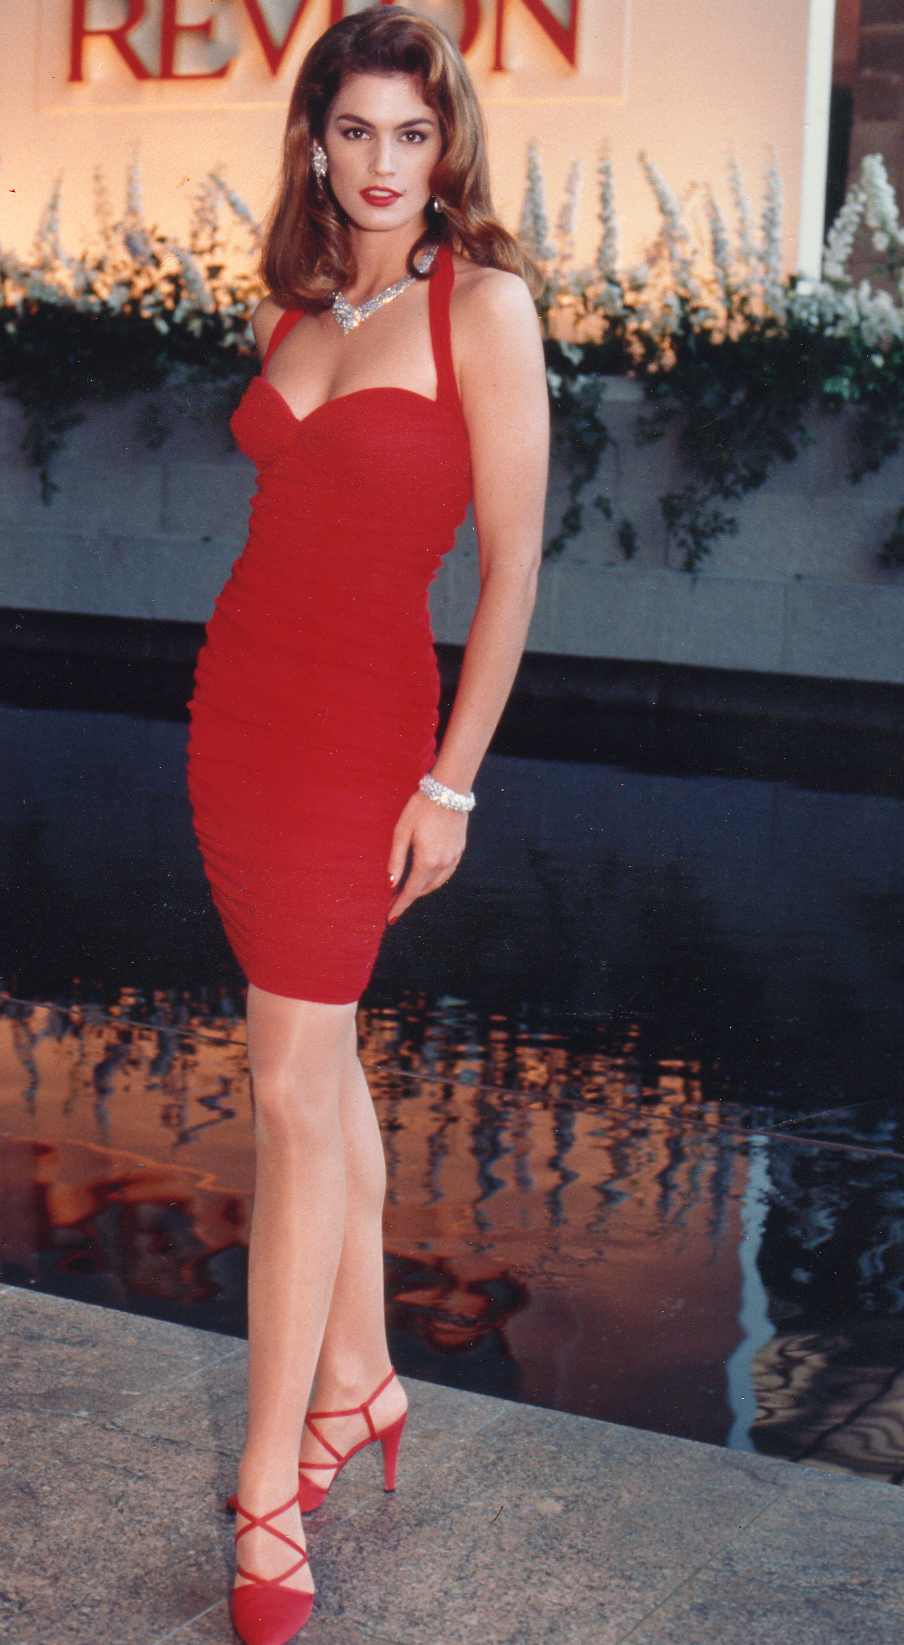 Cindy Crawford Revlon, Metropolitan Museum Event